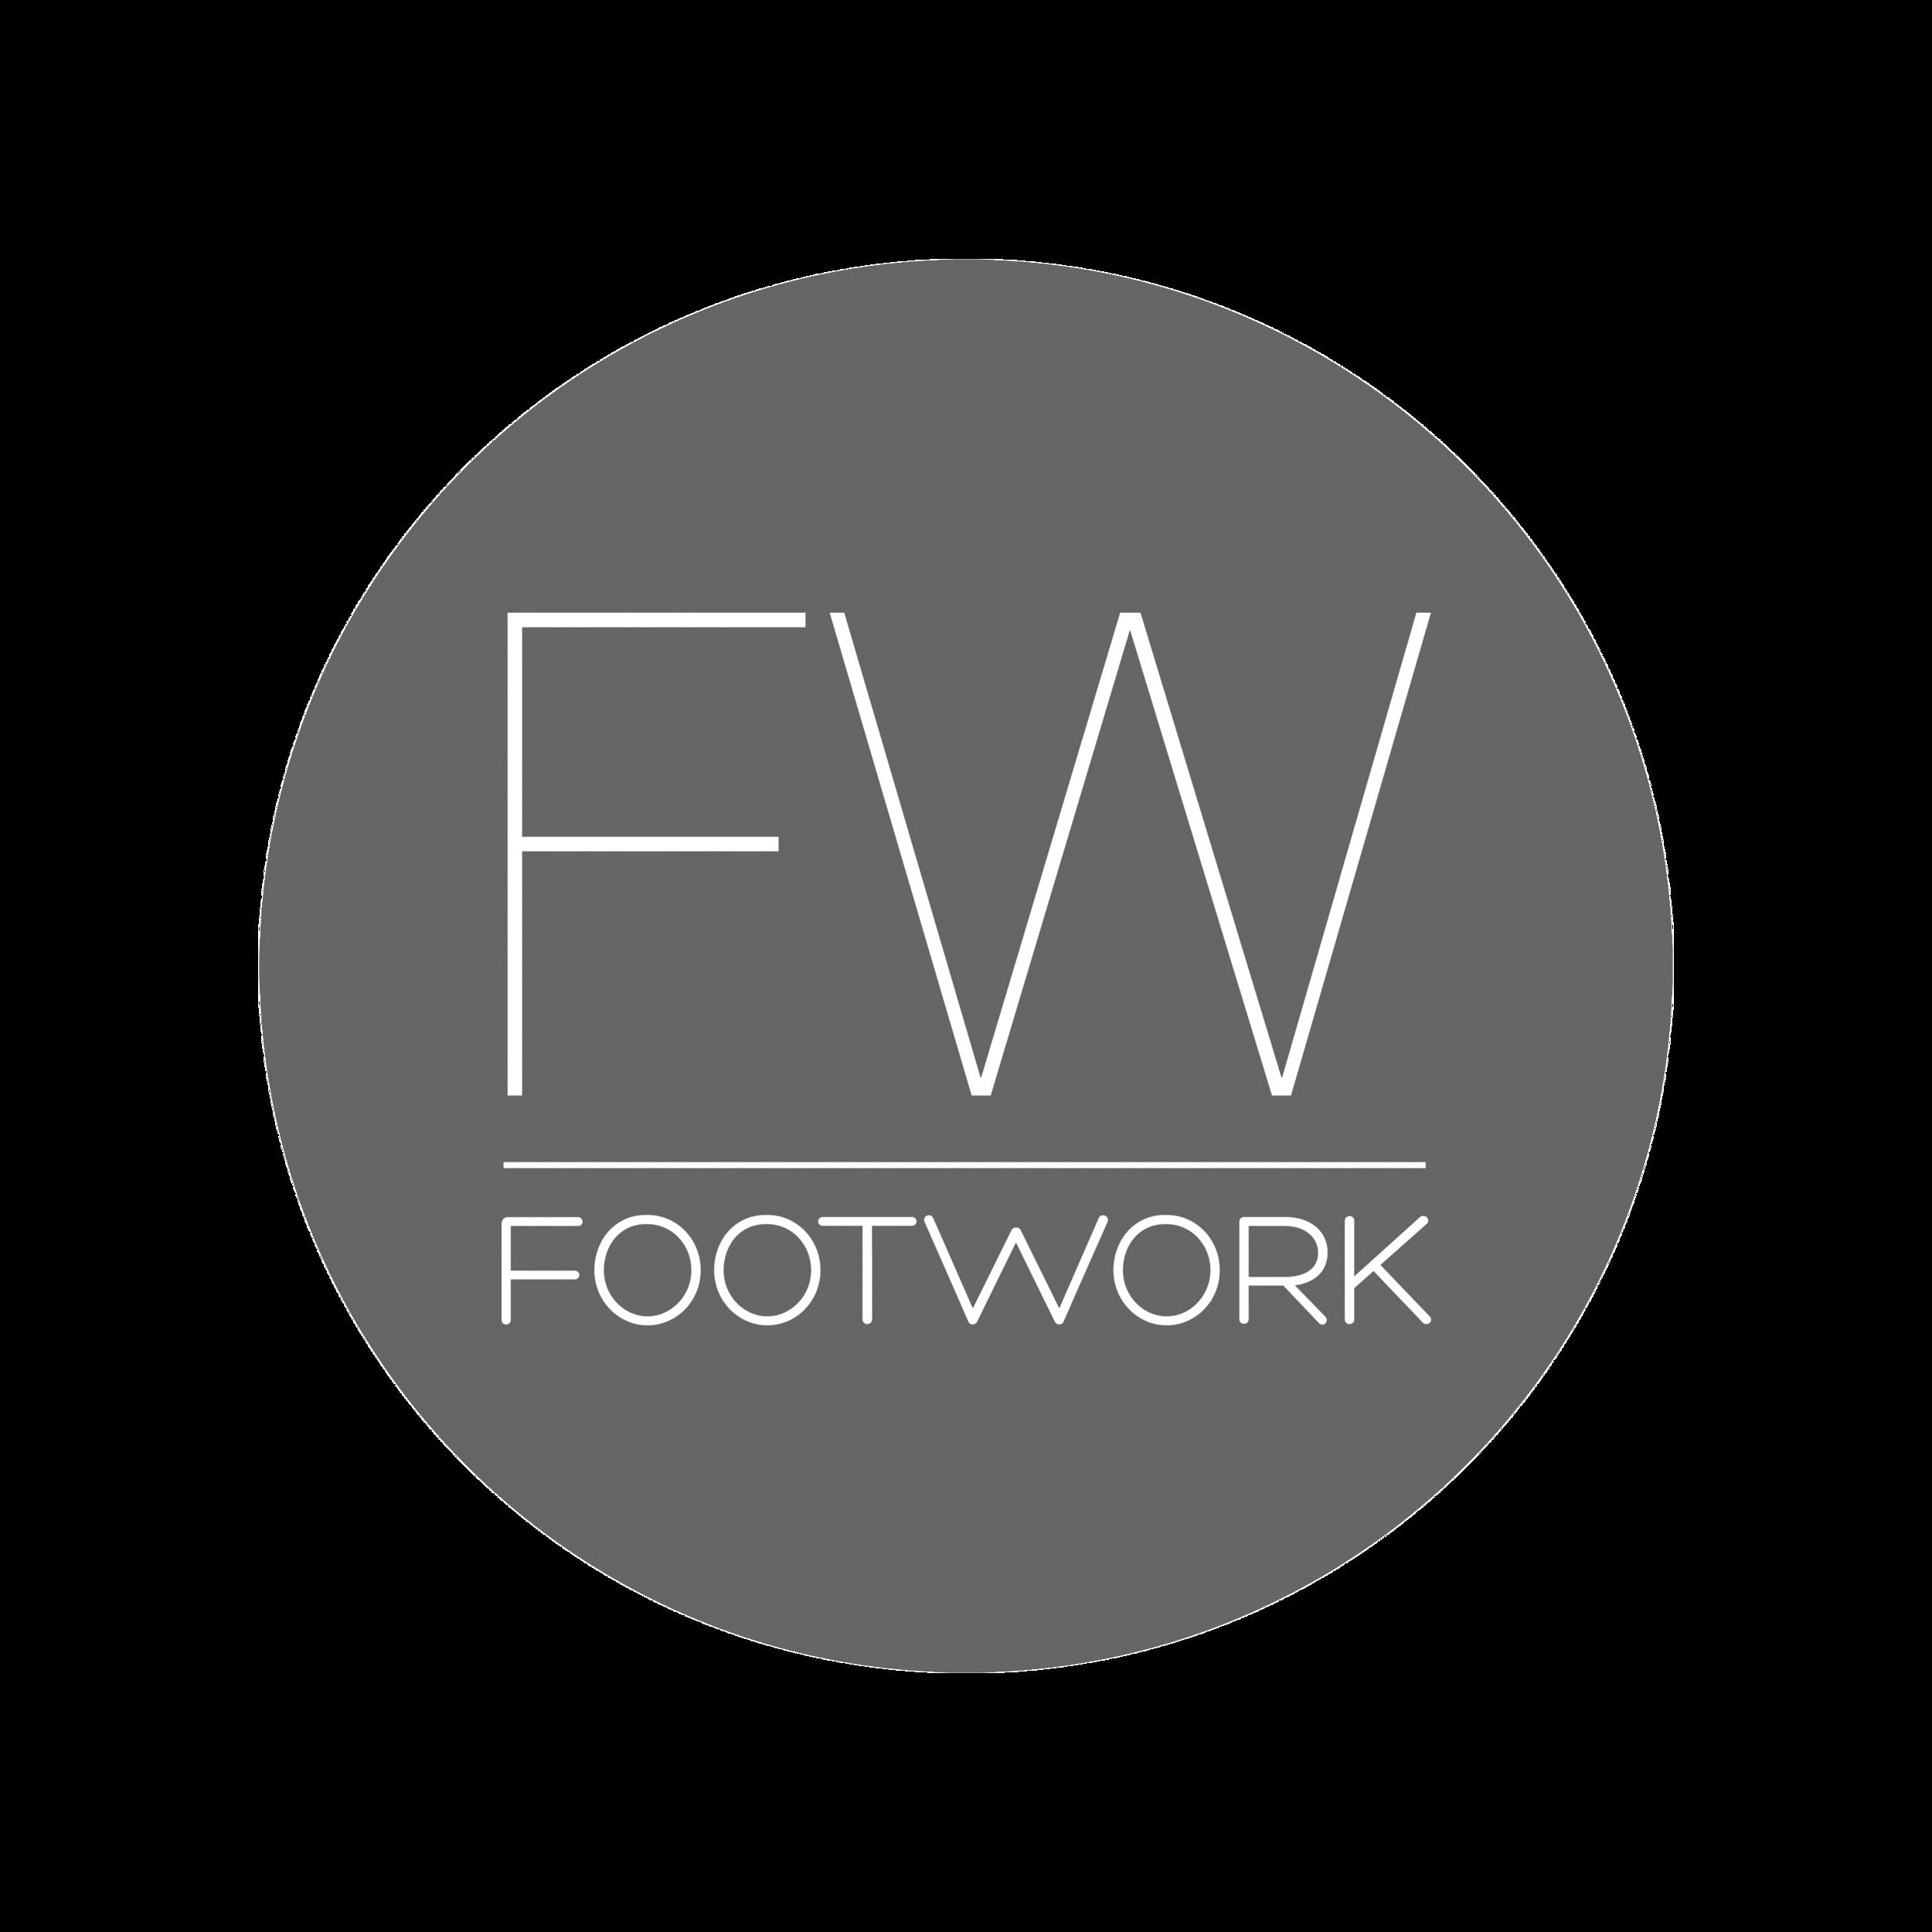 footwork-FINALOGO.png